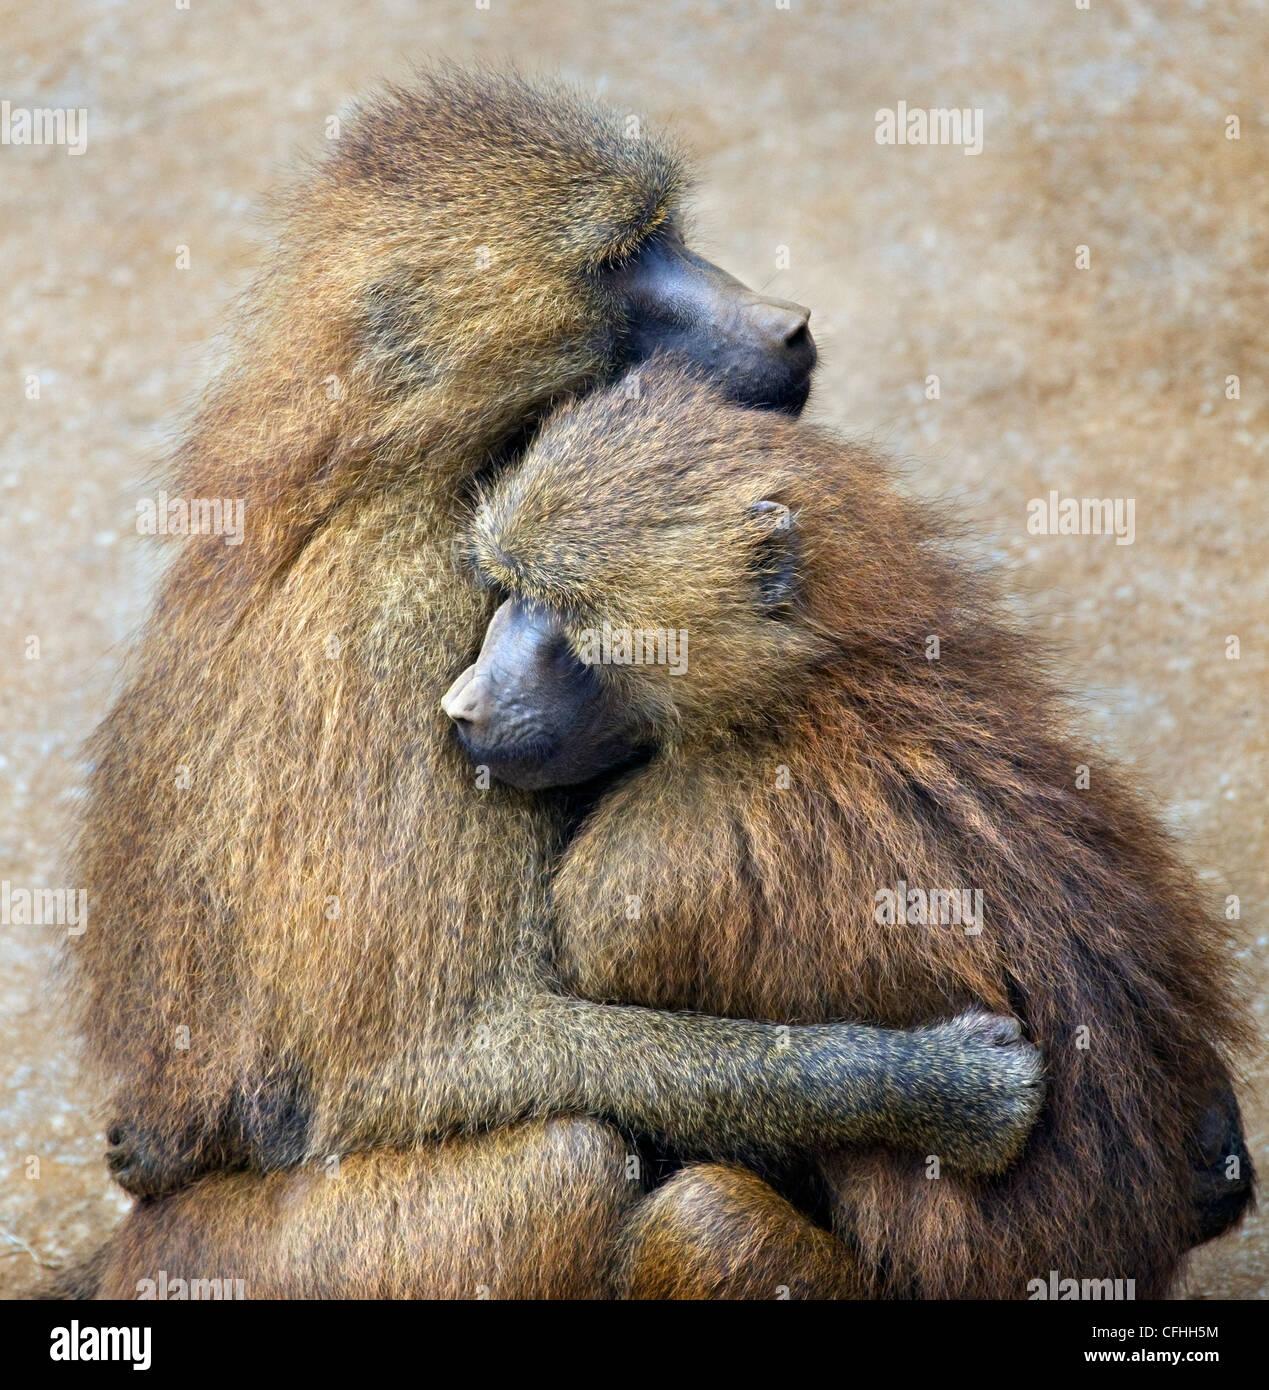 Guiné Baboon casal, Parque Cabarceno, Espanha Imagens de Stock